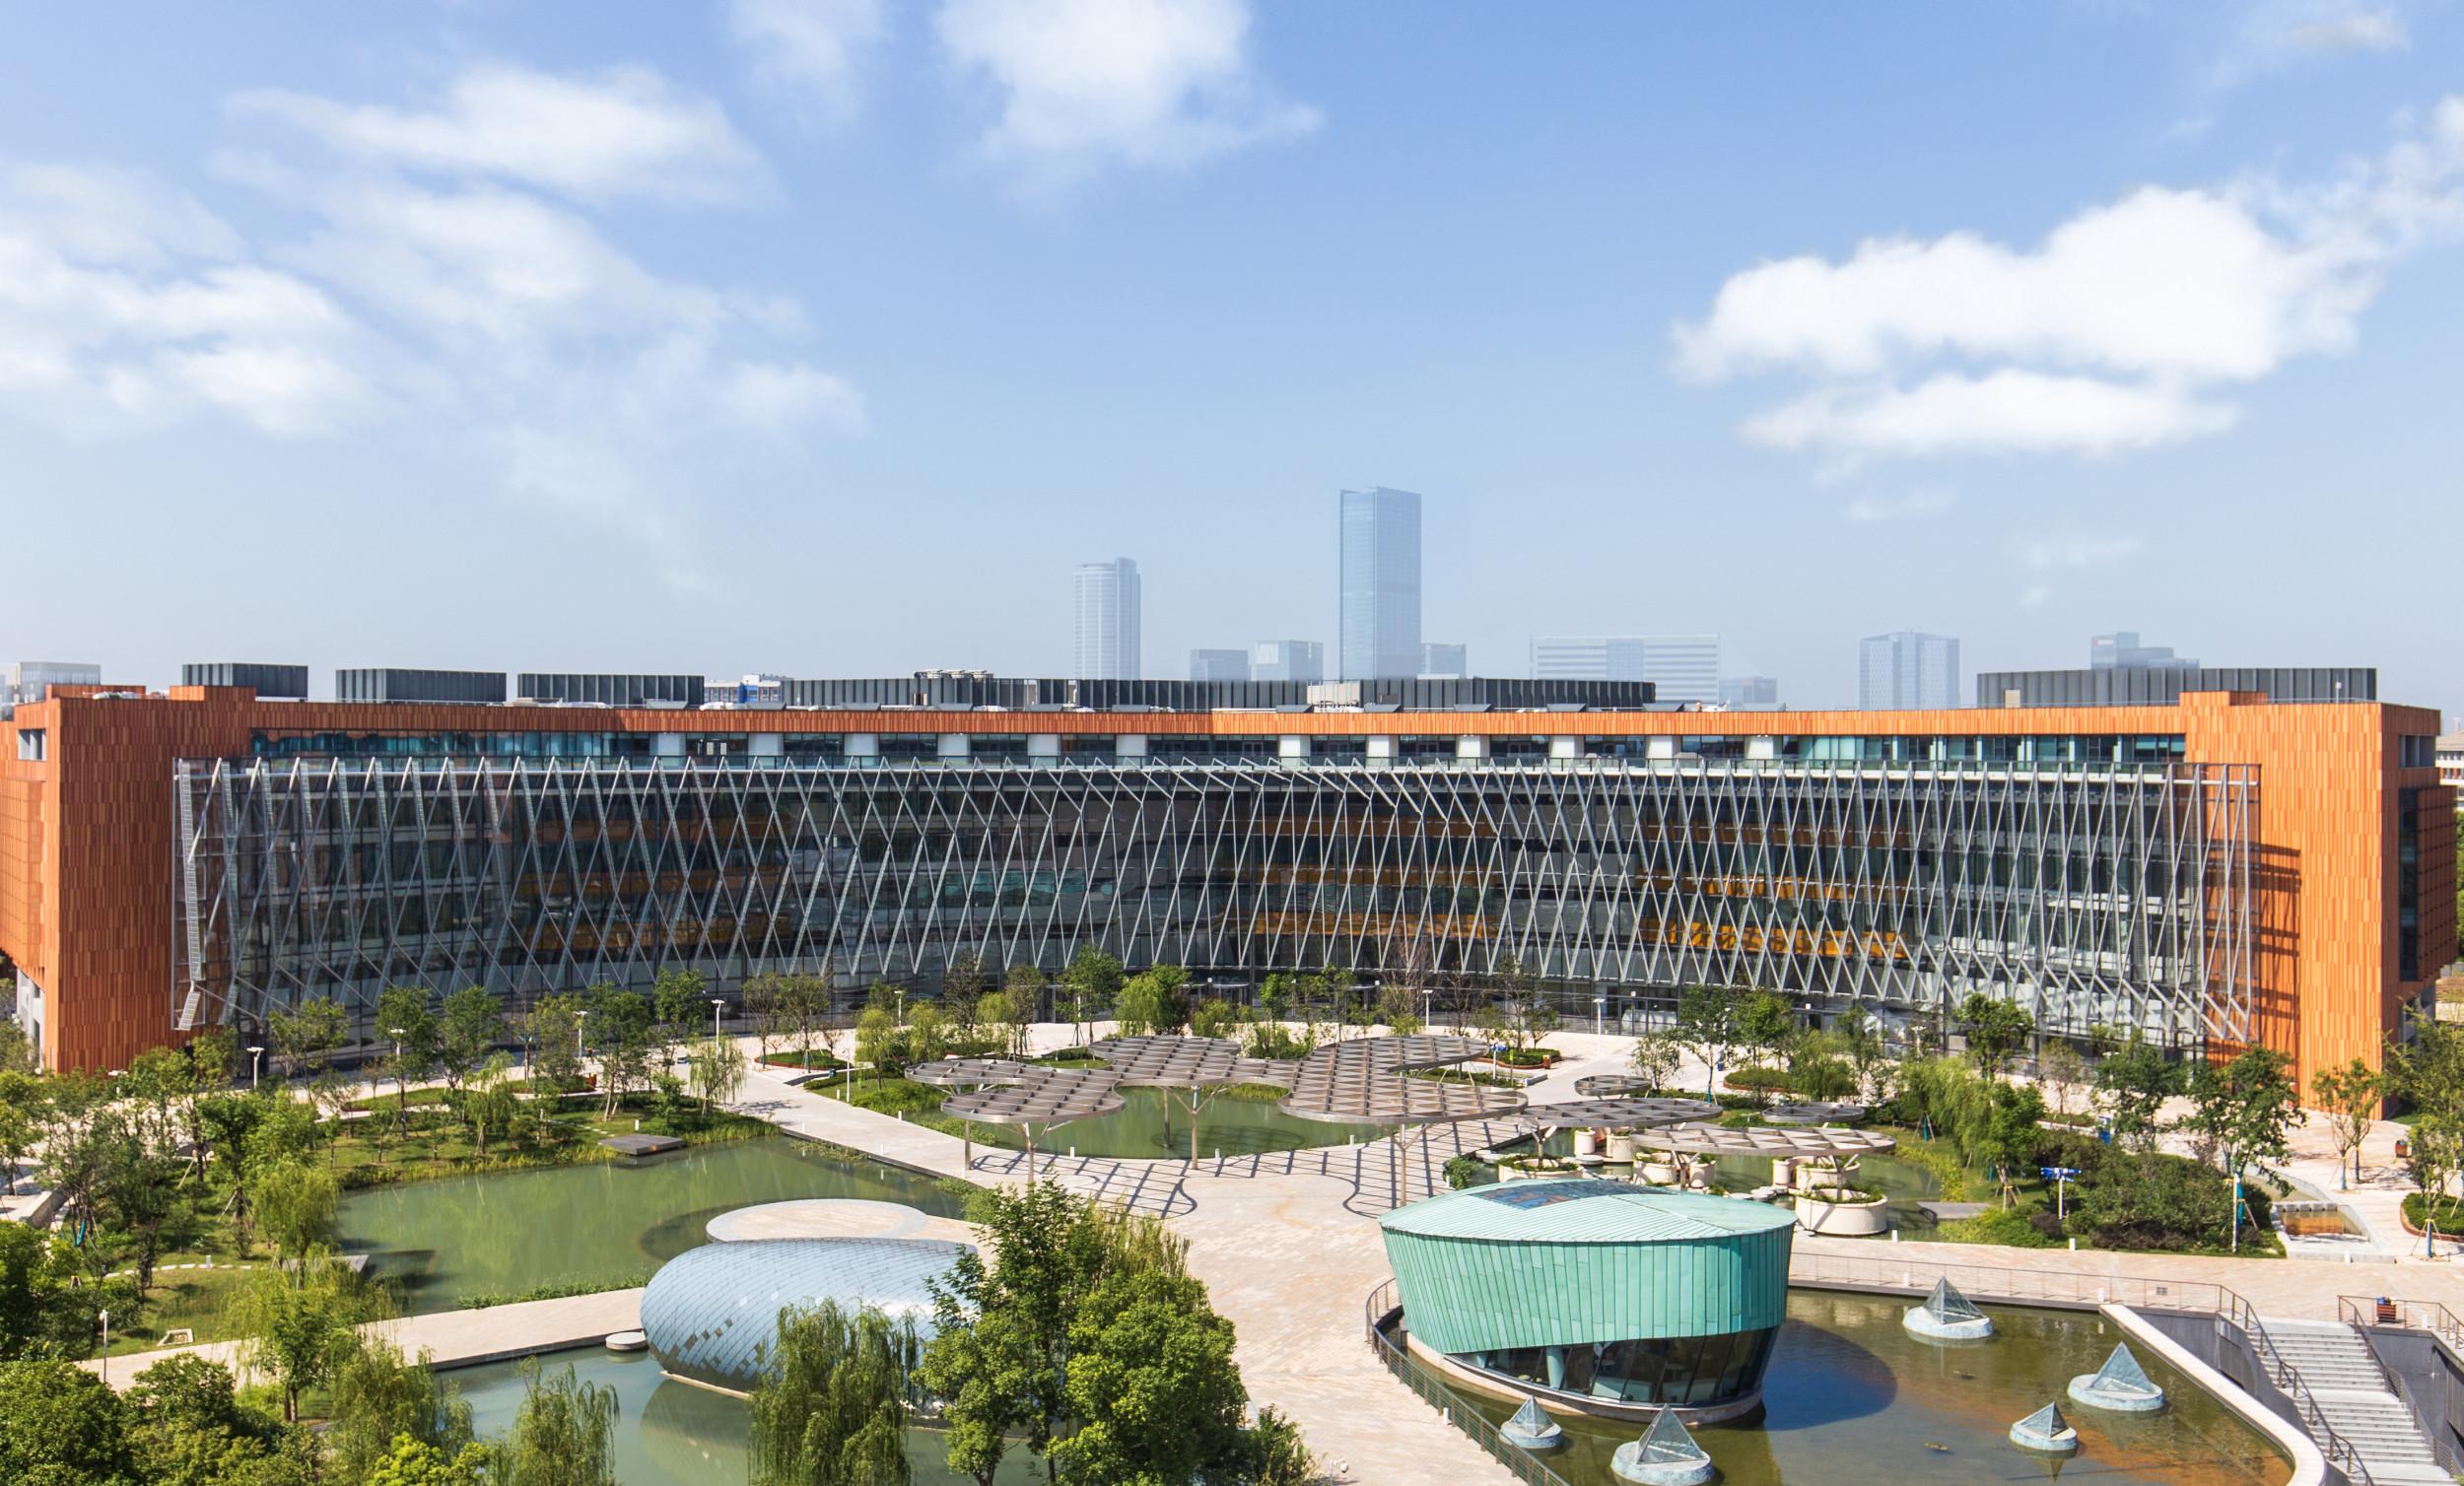 International Business School (IBSS) at Xi'an Jiaotong-Liverpool University (XJTLU)